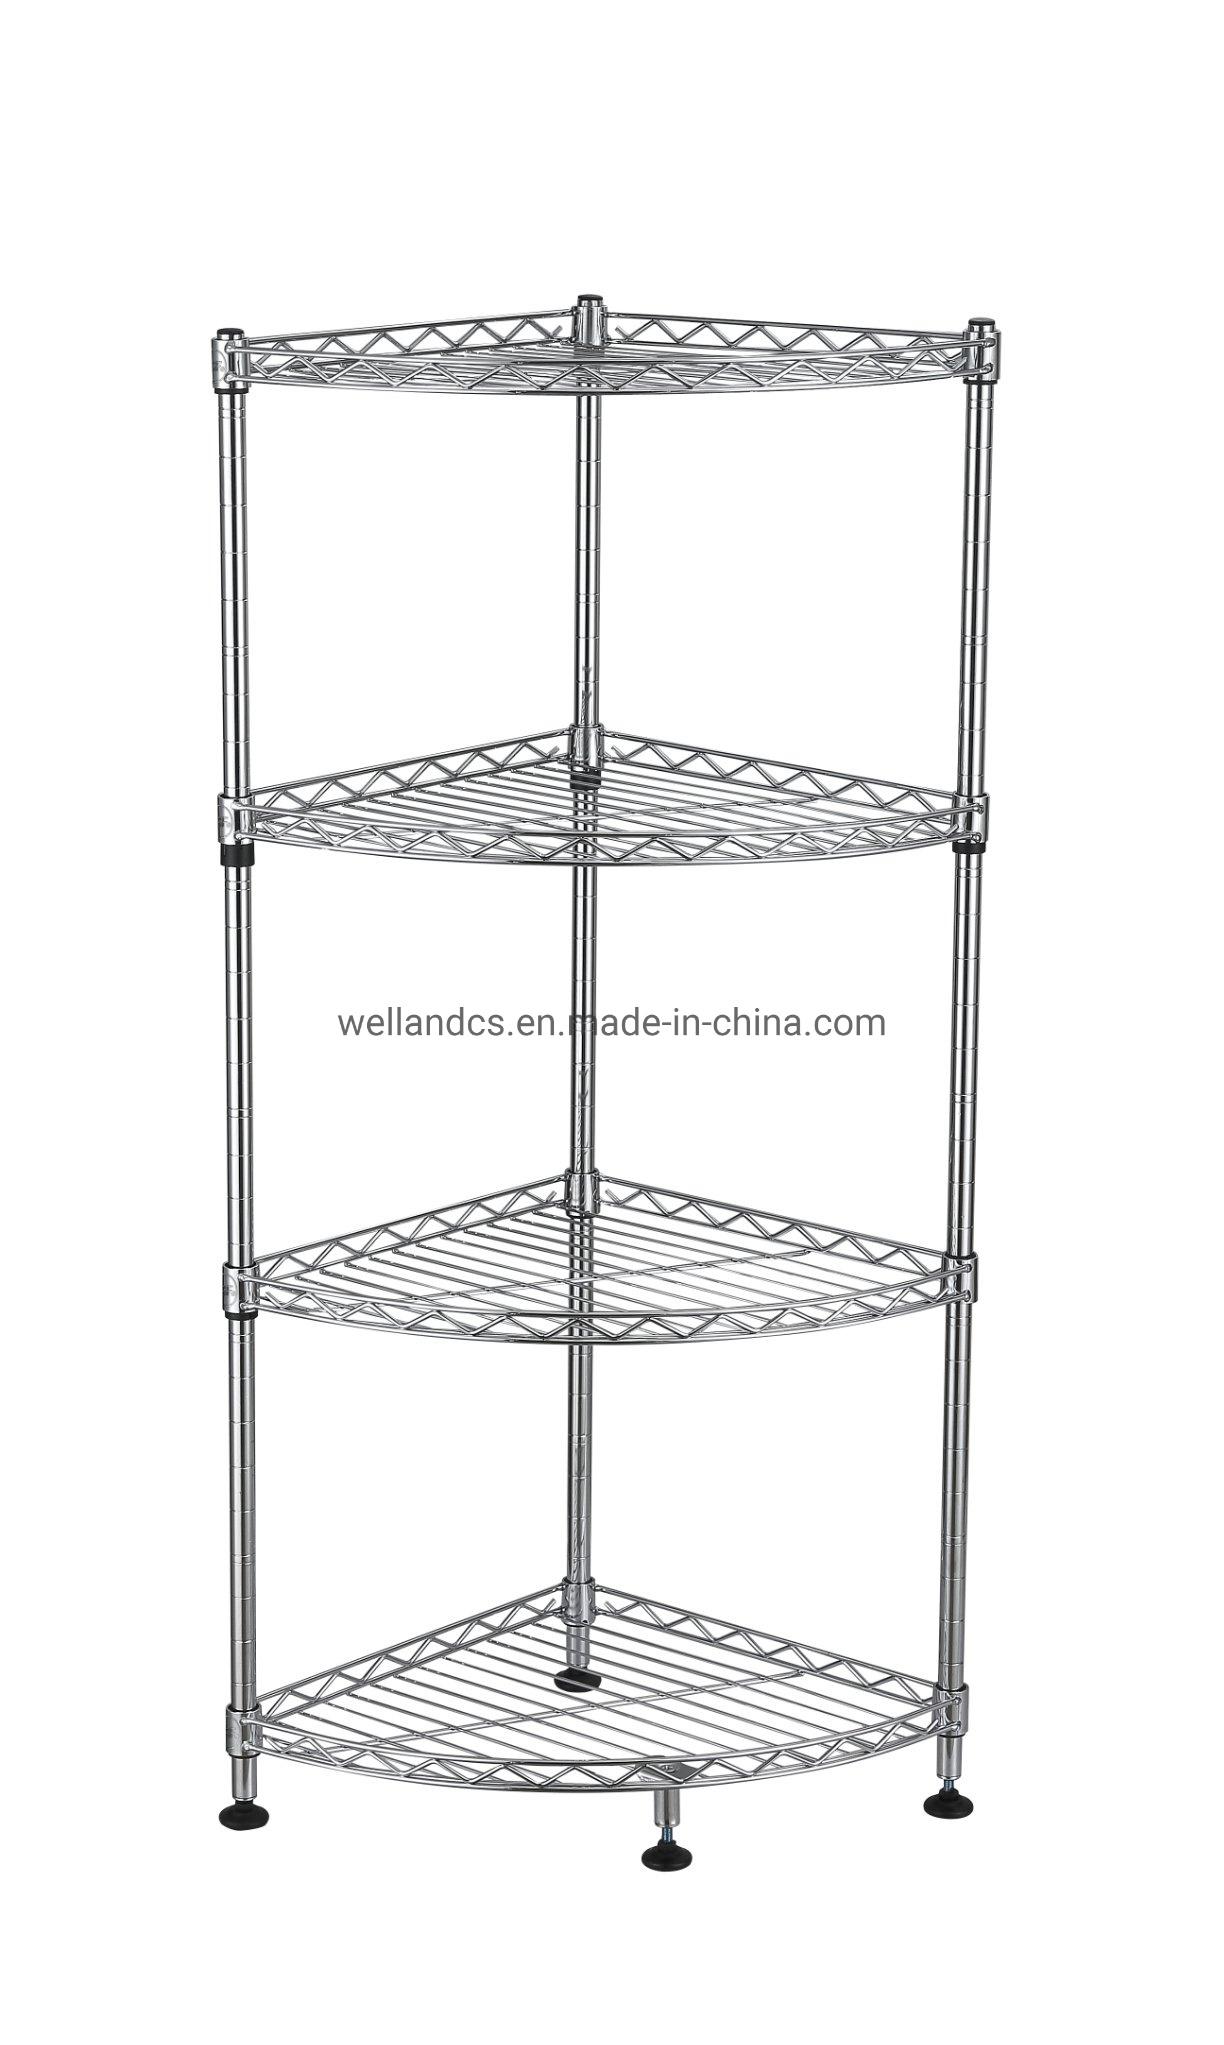 China Fanshaped Chrome Wire Shelf Kitchen Pan Pot Saucepan